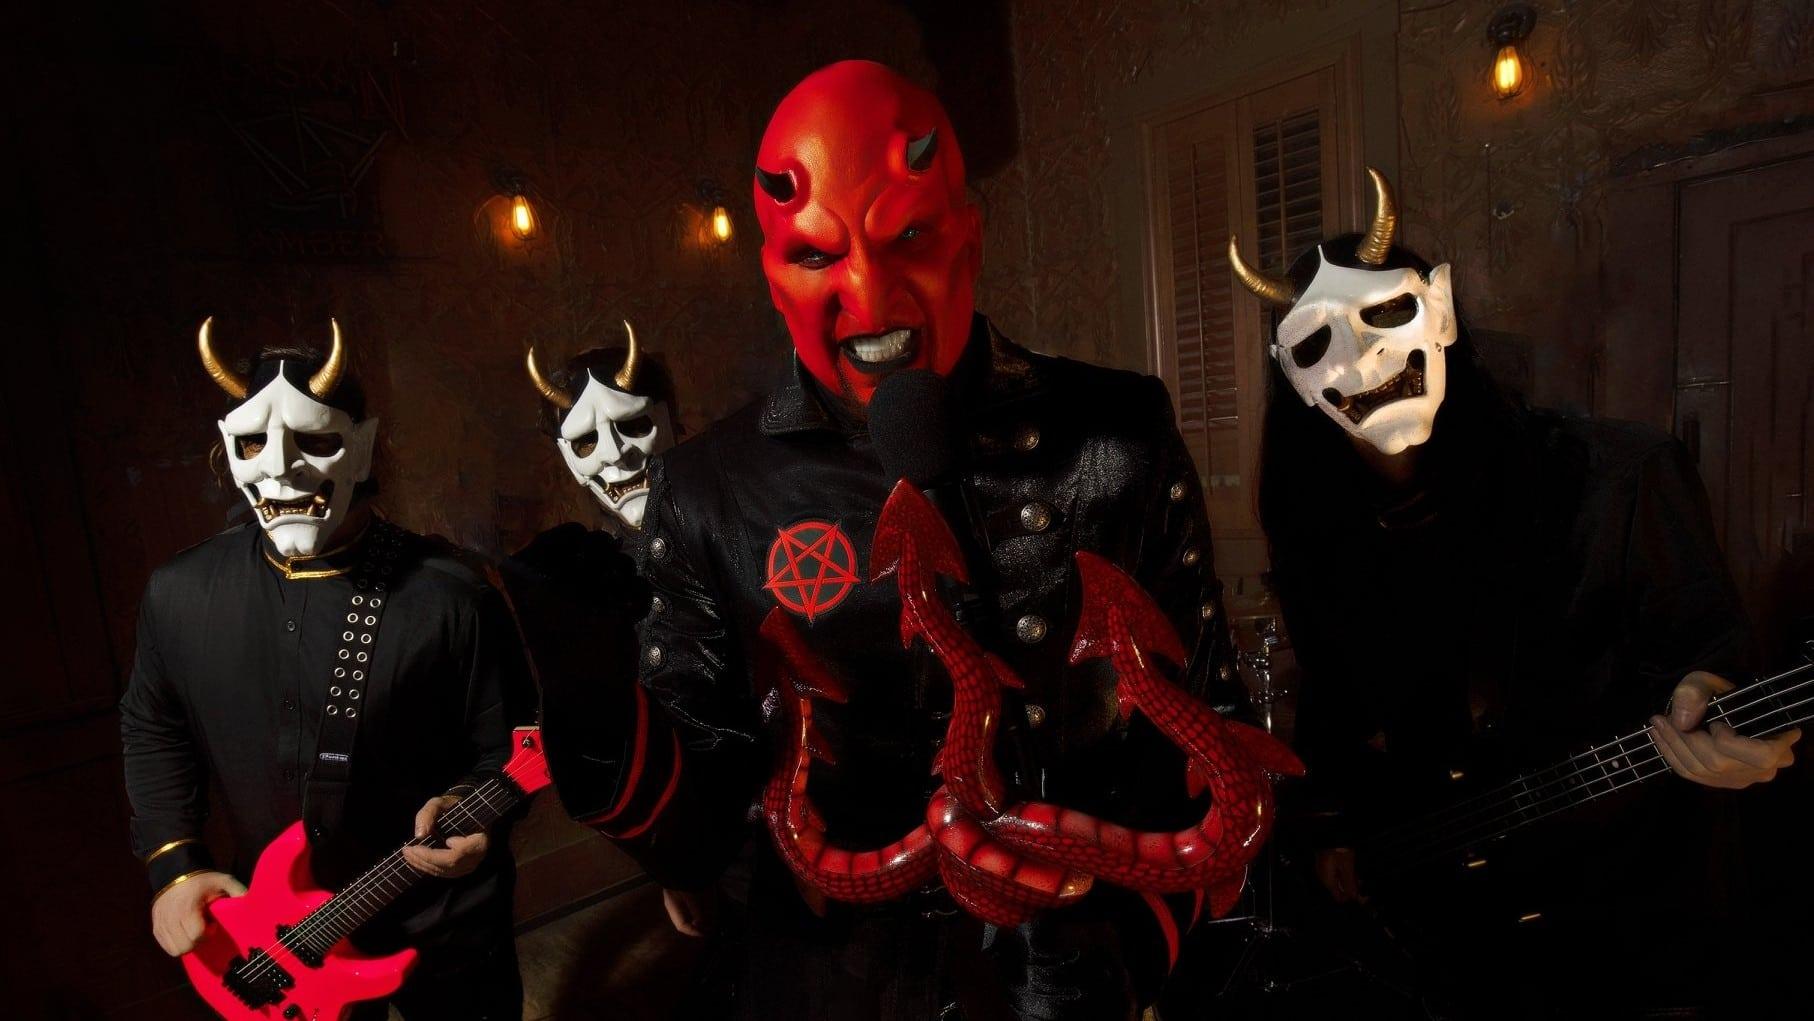 Psychosexual Five Finger Death Punch Jeremy Spencer